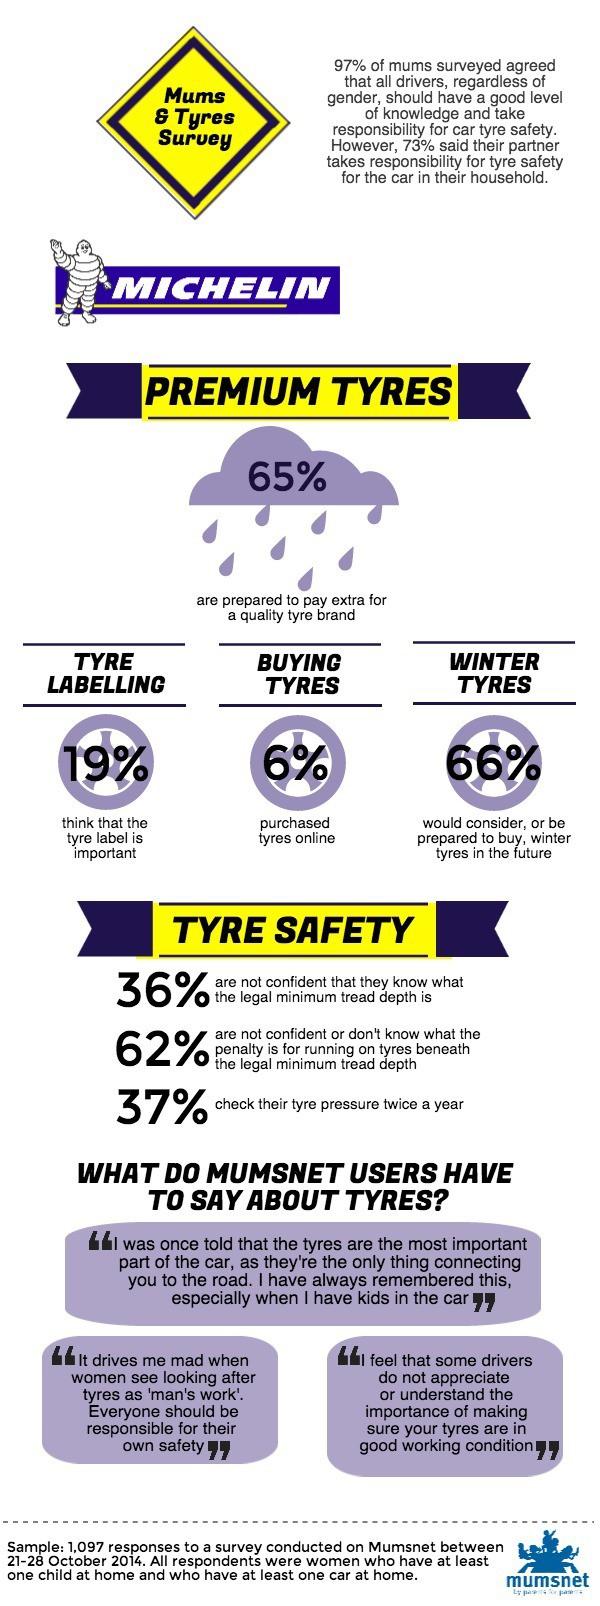 Michelin infographic 27.11.14 v1